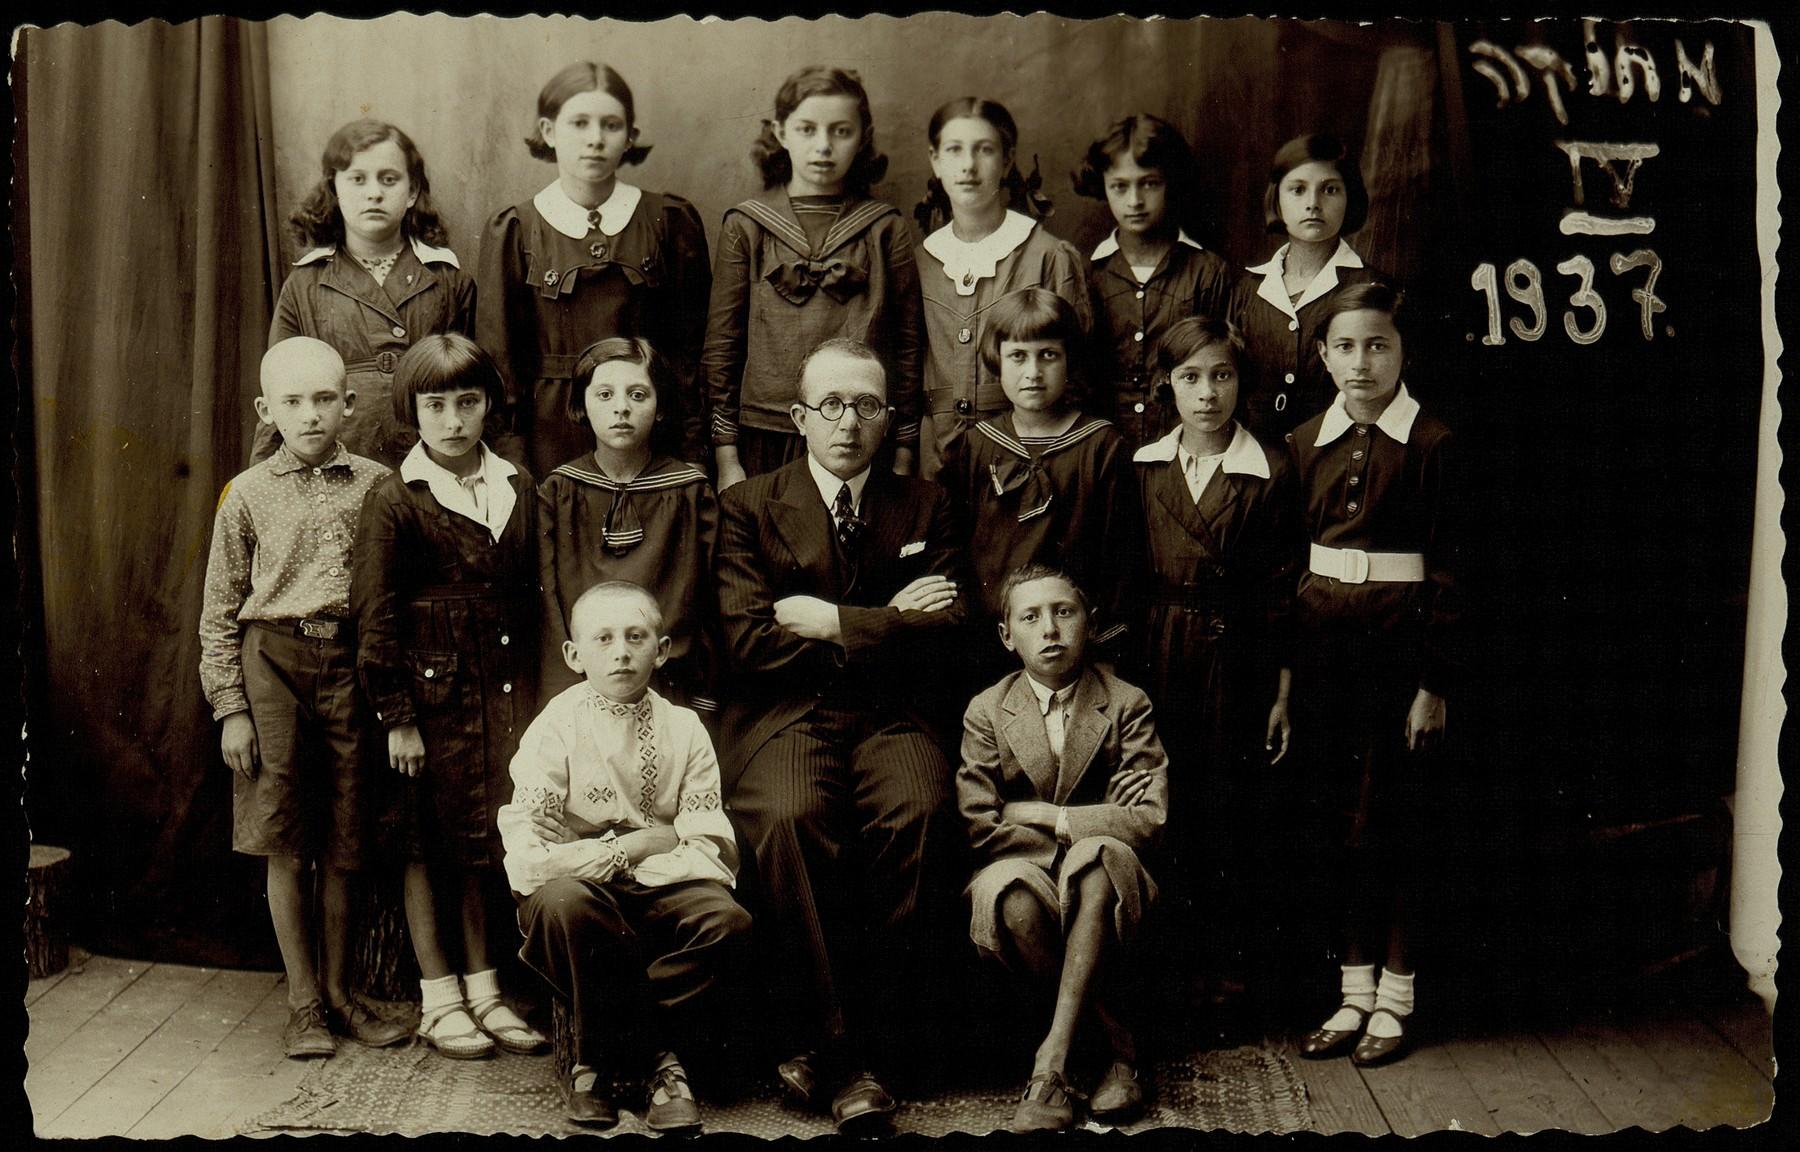 "Fourth grade class picture.   (first row) Avigdor Katz (left ) and Yankele Kaganovicz; (second row, right to left) Sheinele Dwilanski, (first name unknown)  Bichwid, Hayya Shlanski, Hebrew teacher Mr. Okun, (first name unknown) Narodowicz, (name unknown), Leibke Portnoy;  (top row, right to left) name unknown, Leah Michalowski, ""The Rubishker"", Altke Koutsai, Masha Dubczanski, Rachel Koppelman.    Hayya immigrated to America, Rochke Koppelman was killed by the Polish Home Army; the others were murdered in the September 1941 massacre."